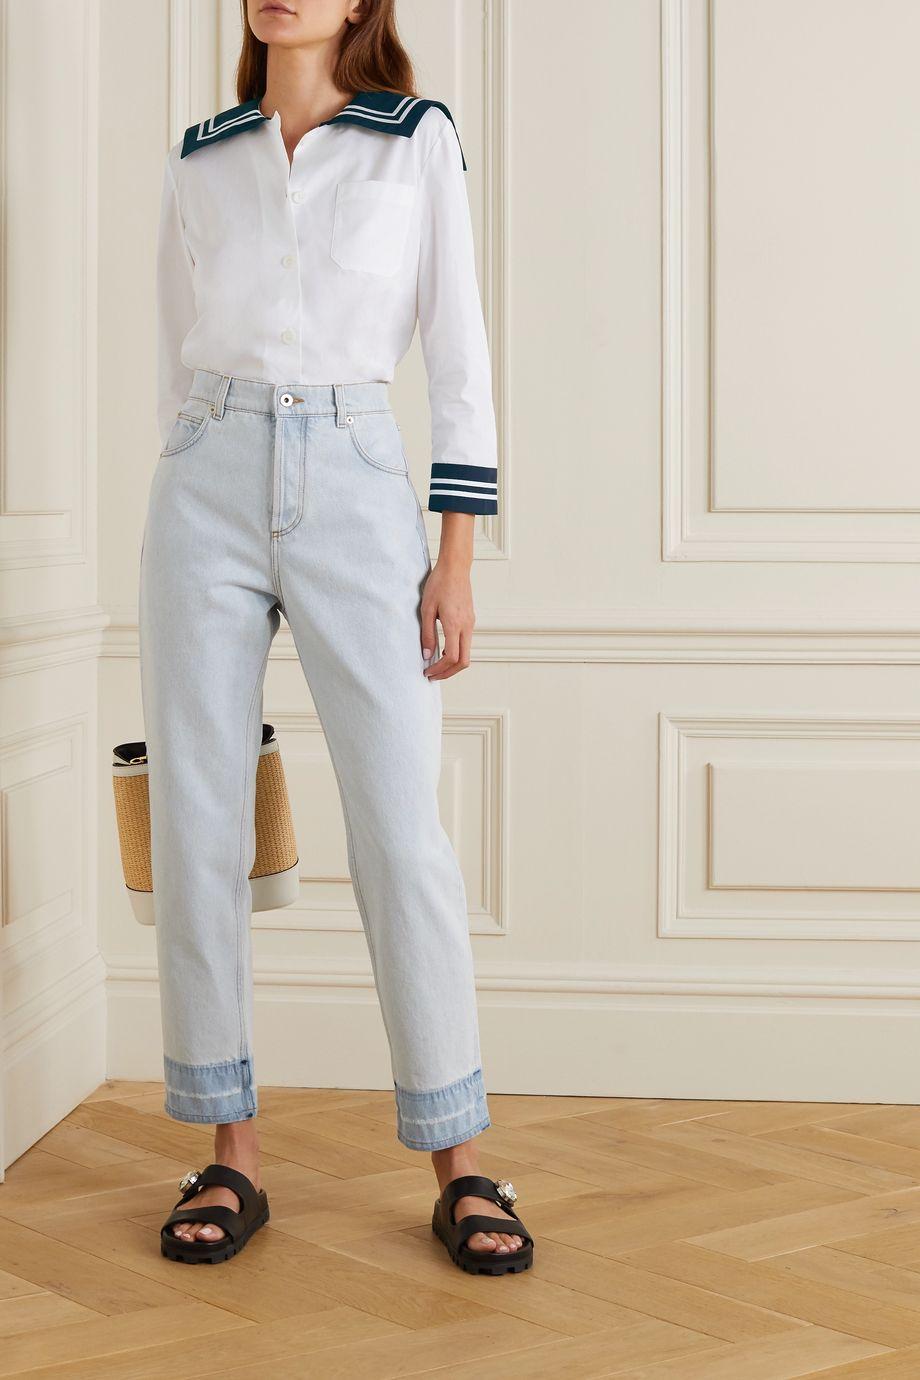 Miu Miu Zweifarbige Bluse aus Baumwollpopeline